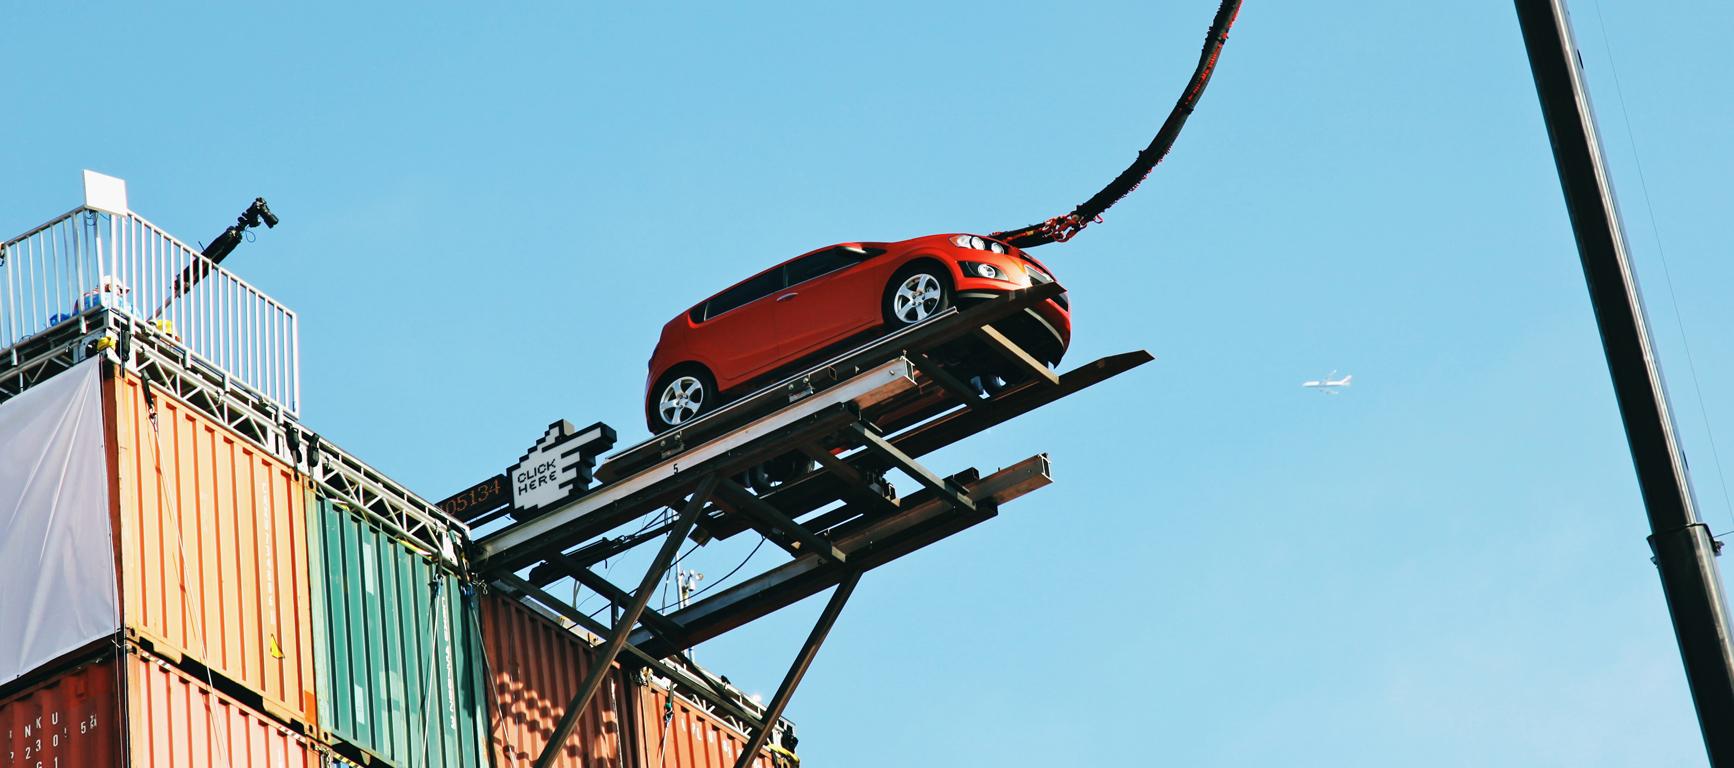 Chevy Bungee Stunt